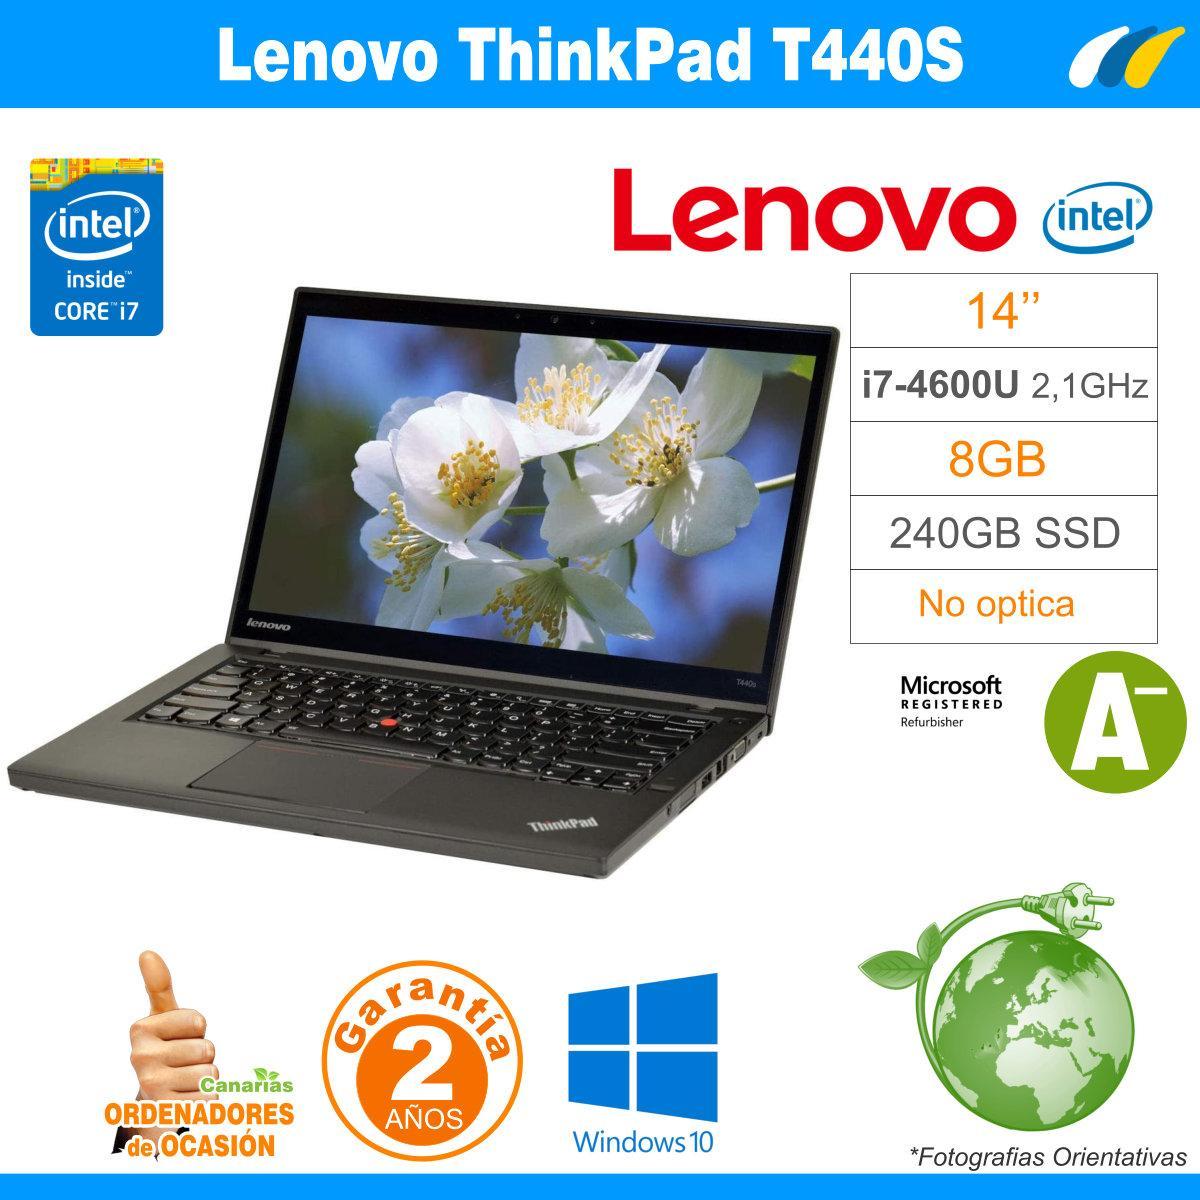 Intel® I7-4600U - 8GB - 240GB SSD - LENOVO THINKPAD T440S